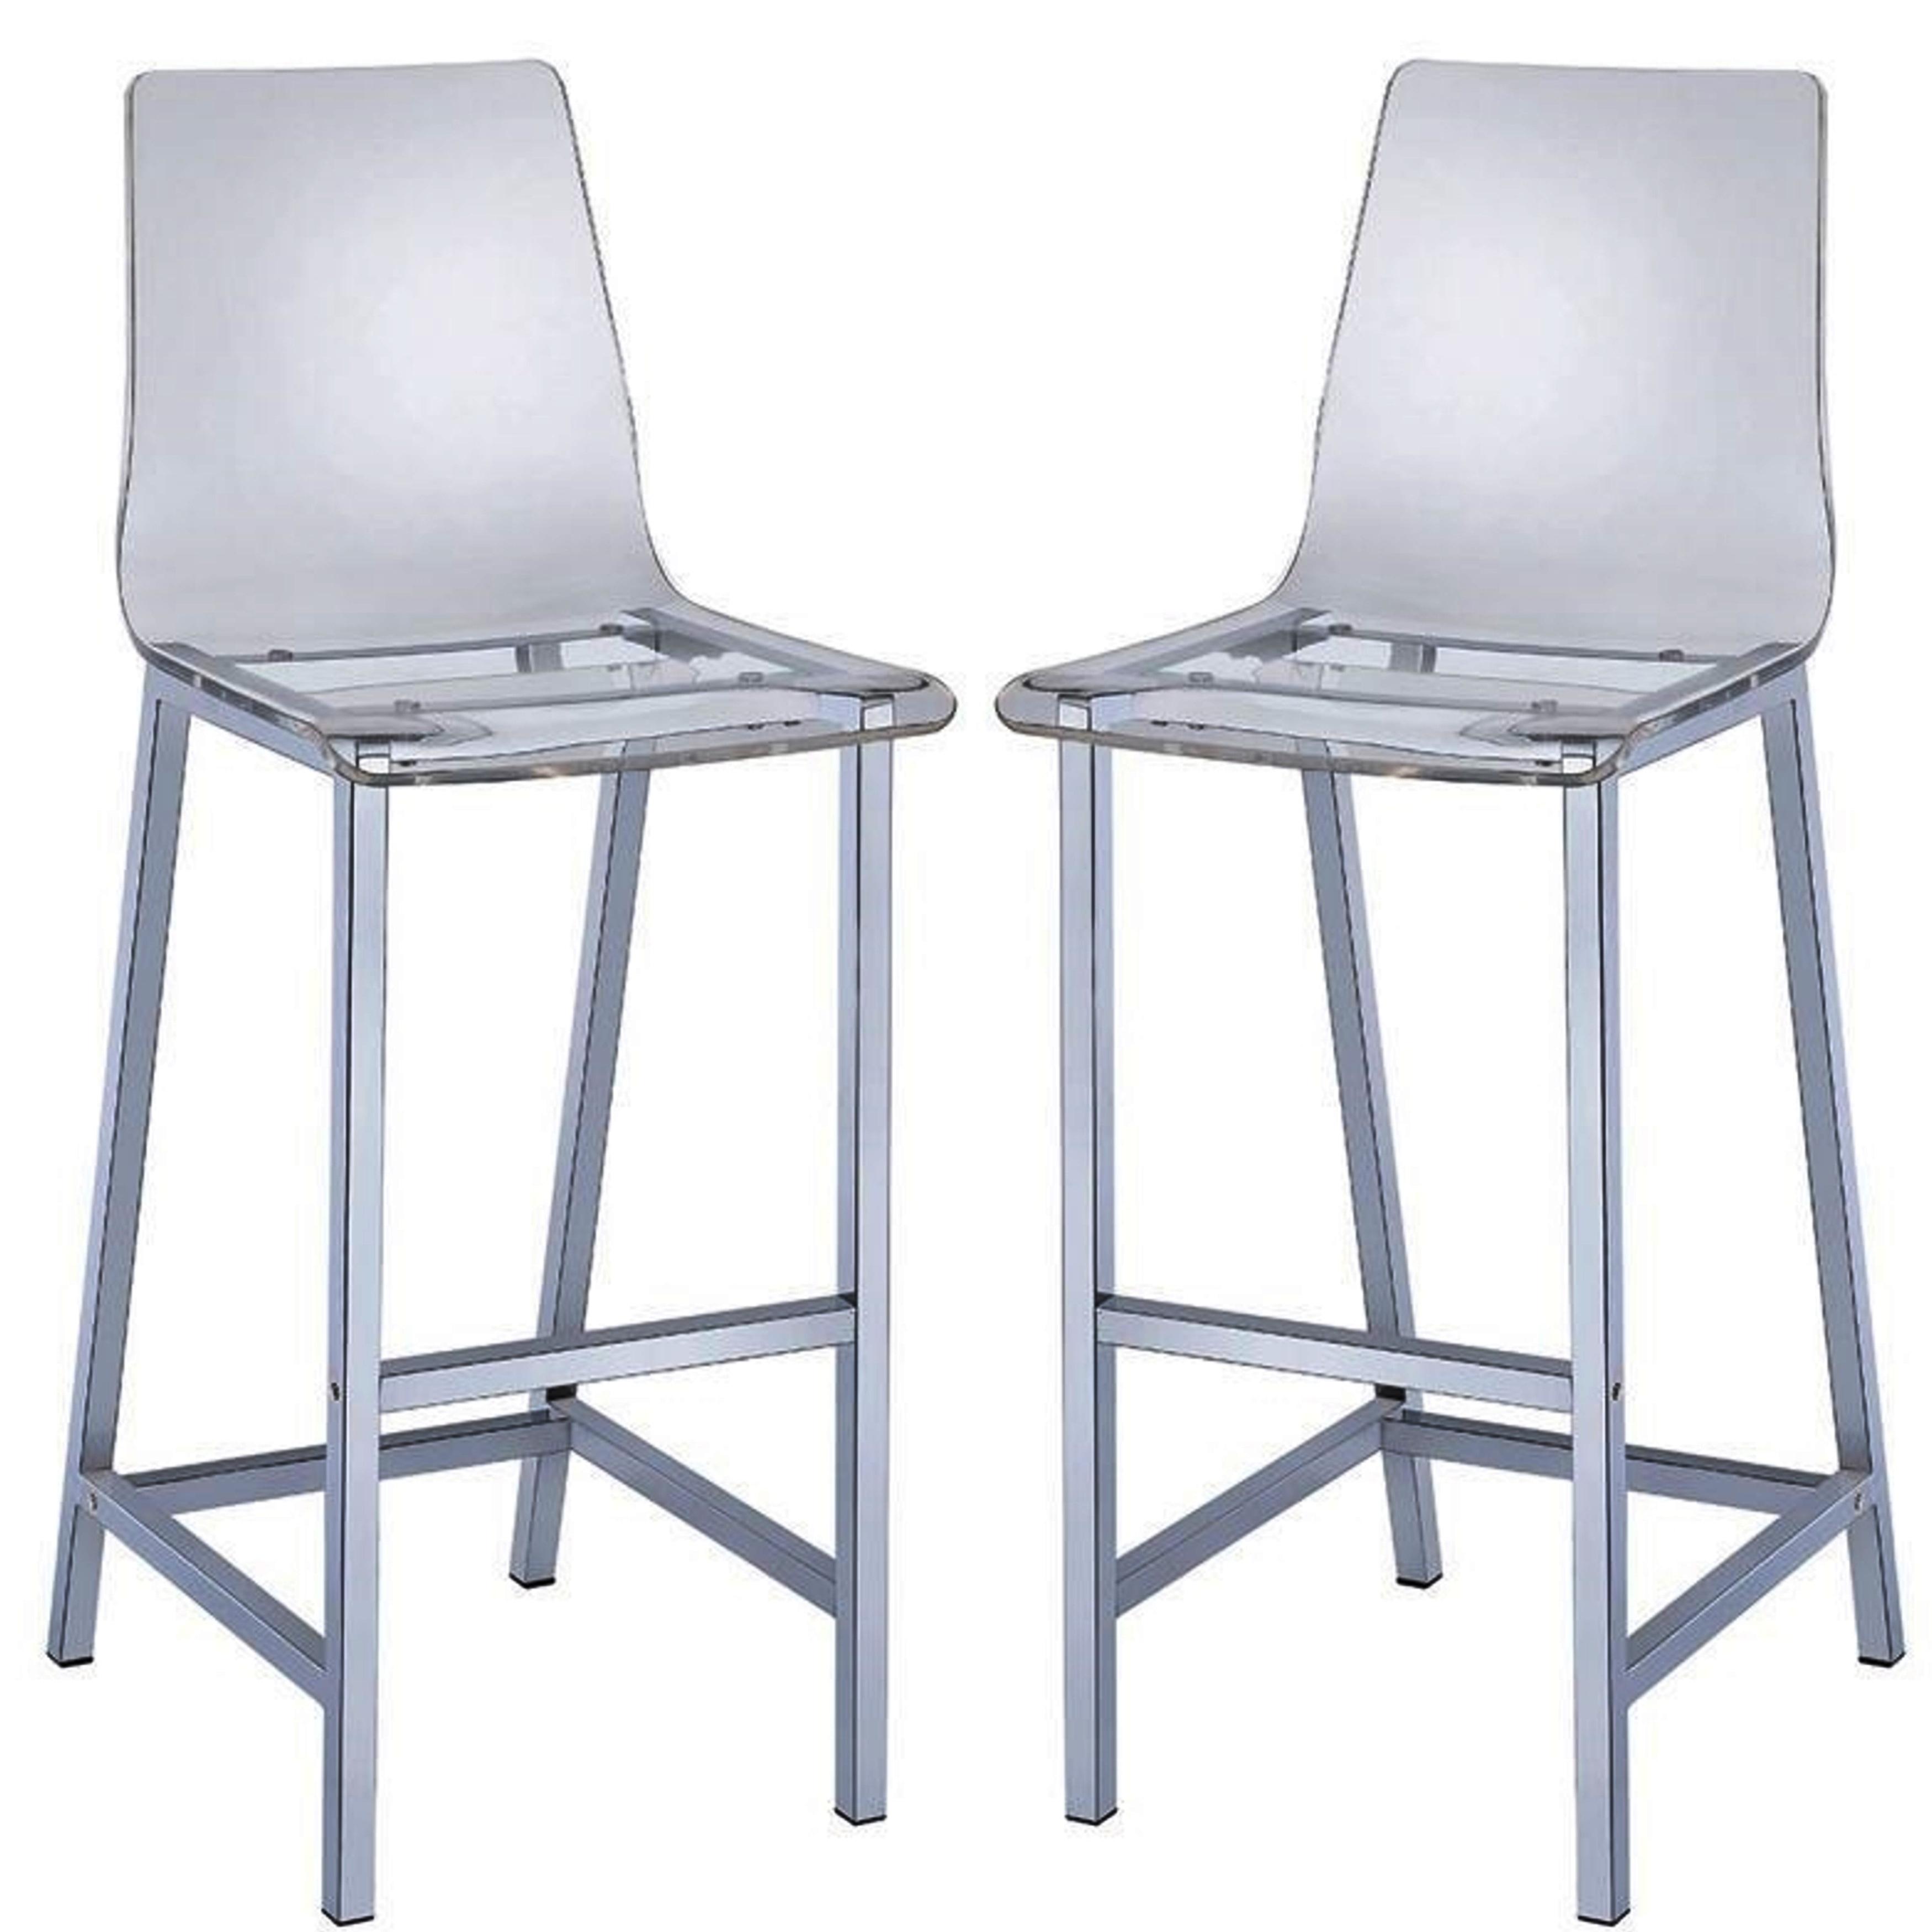 Shop melaney art deco sleek design clear acrylic bar stools set of 2 free shipping today overstock com 10883313